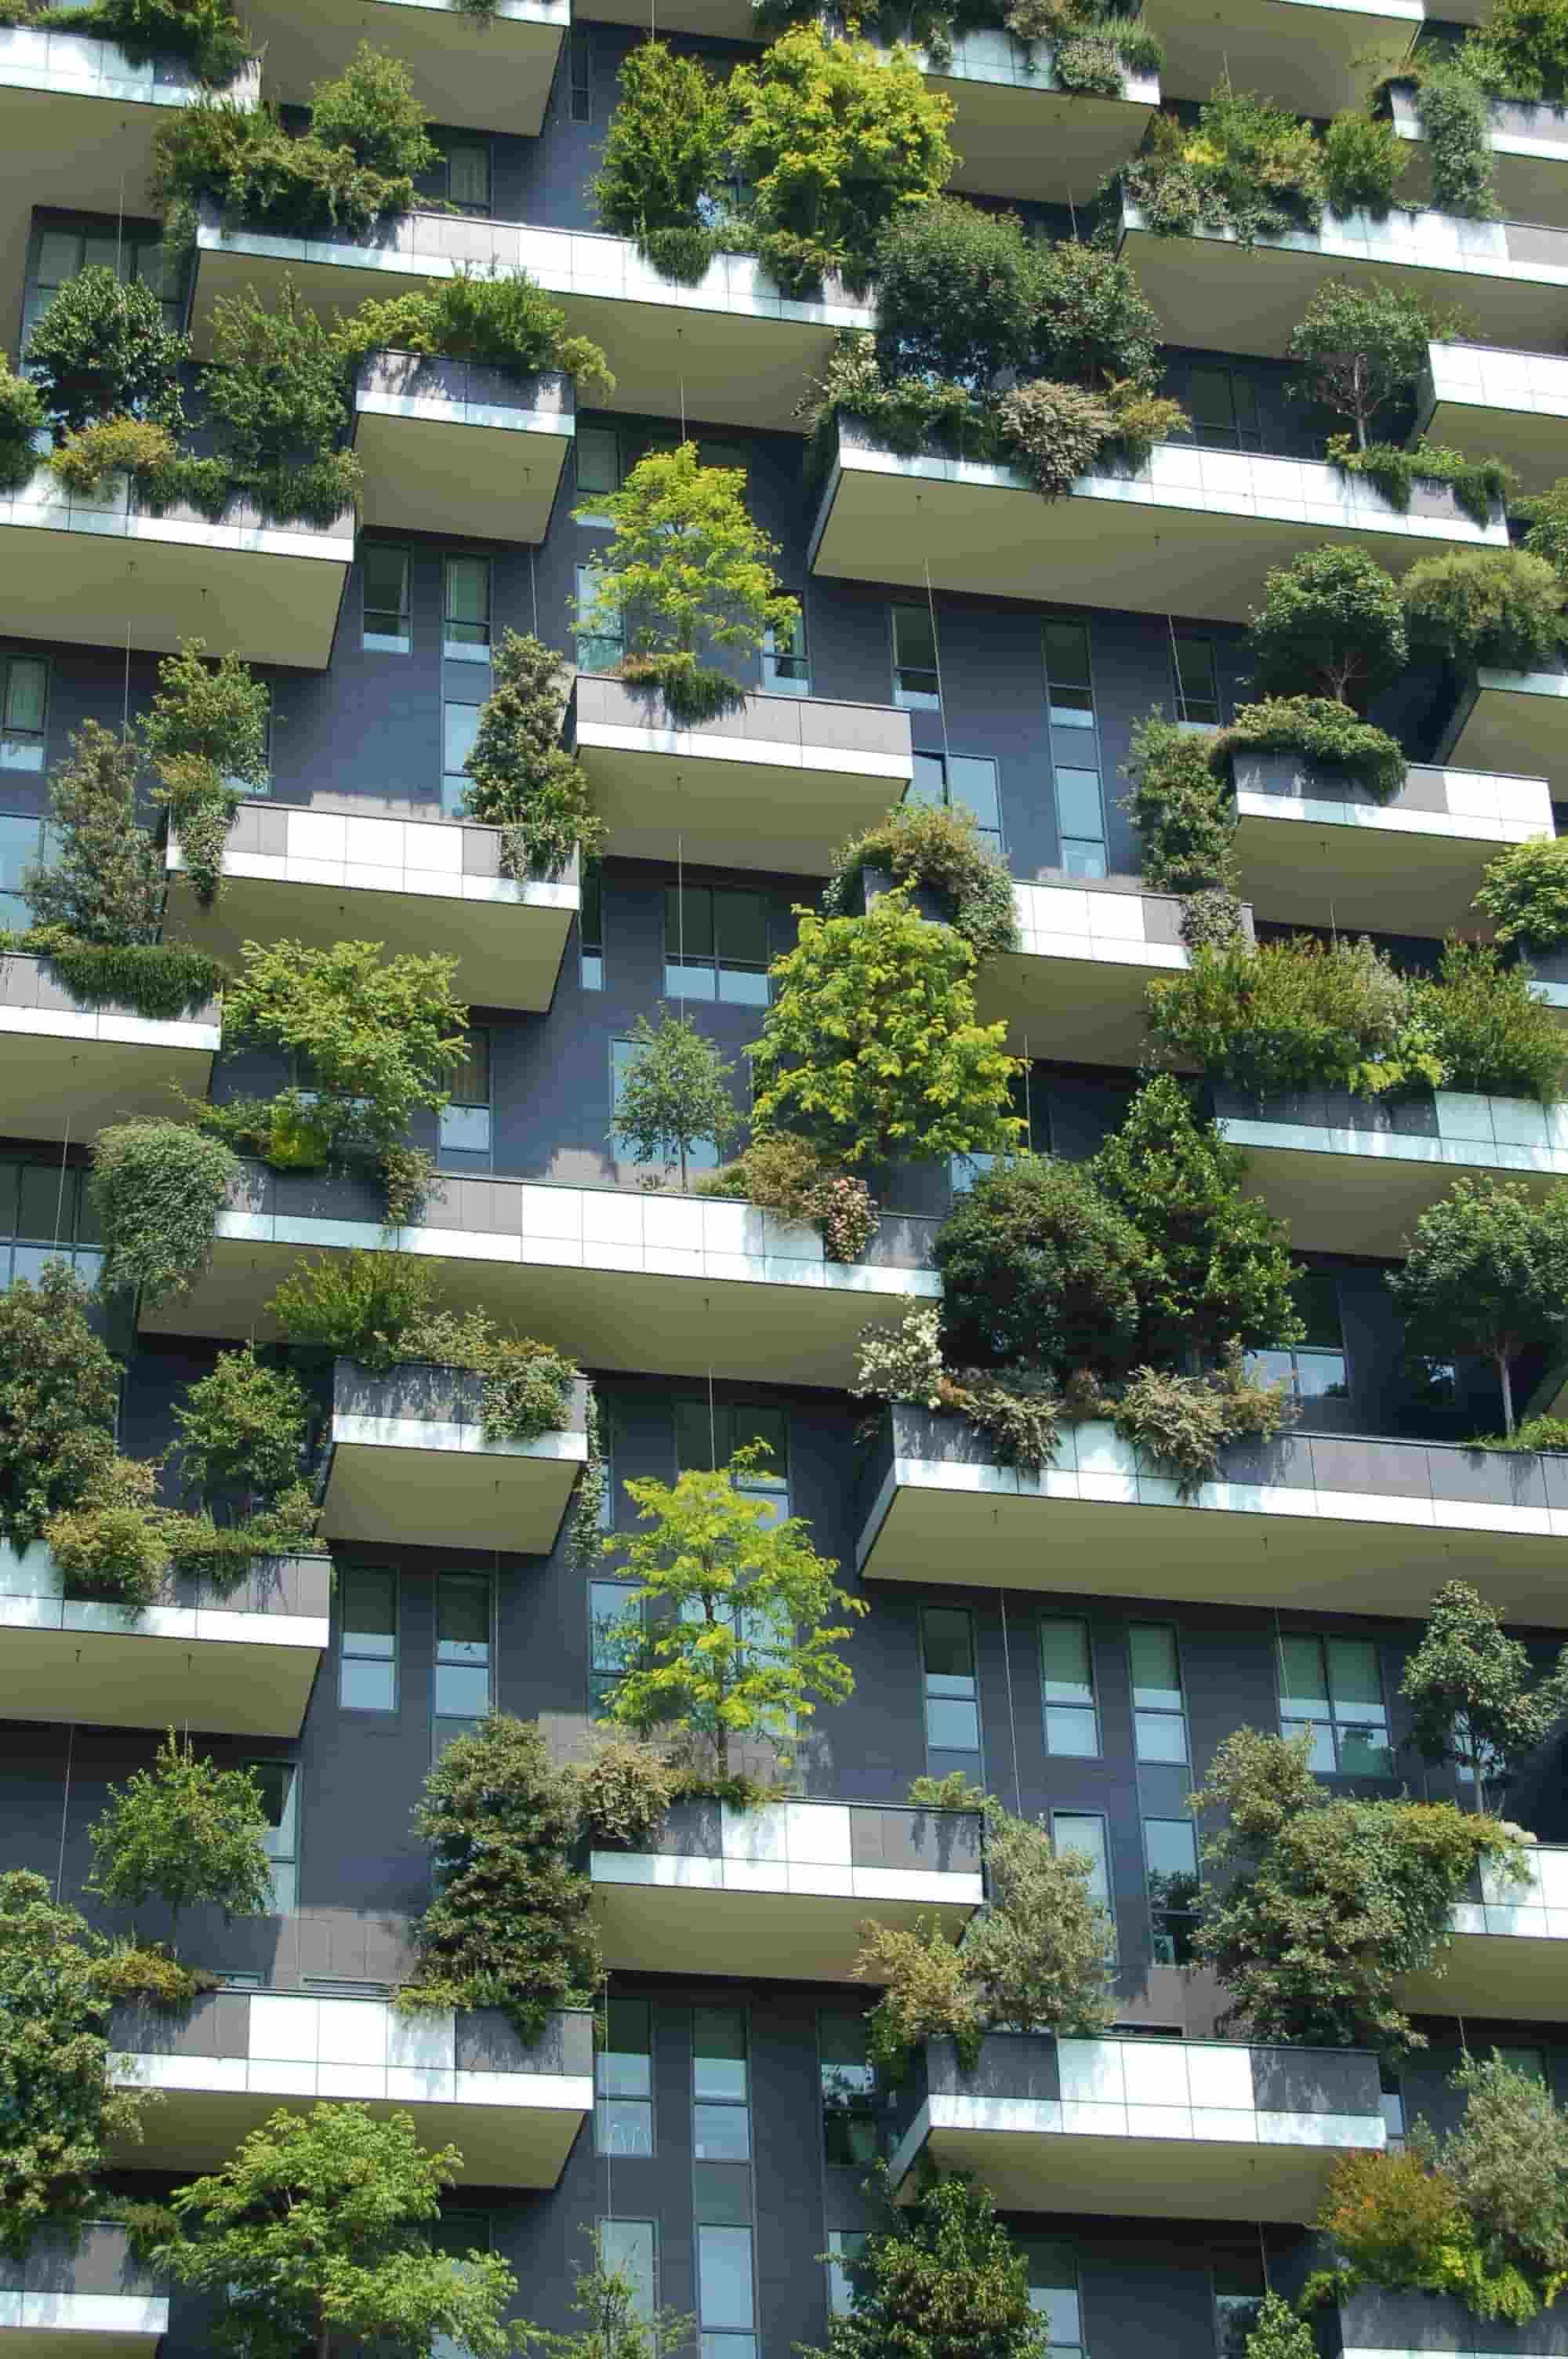 5 Tips for dealing with eco-anxiety from www.goingzerowaste.com #eco #zerowaste #sustainable #anxiety #ecoanxiety